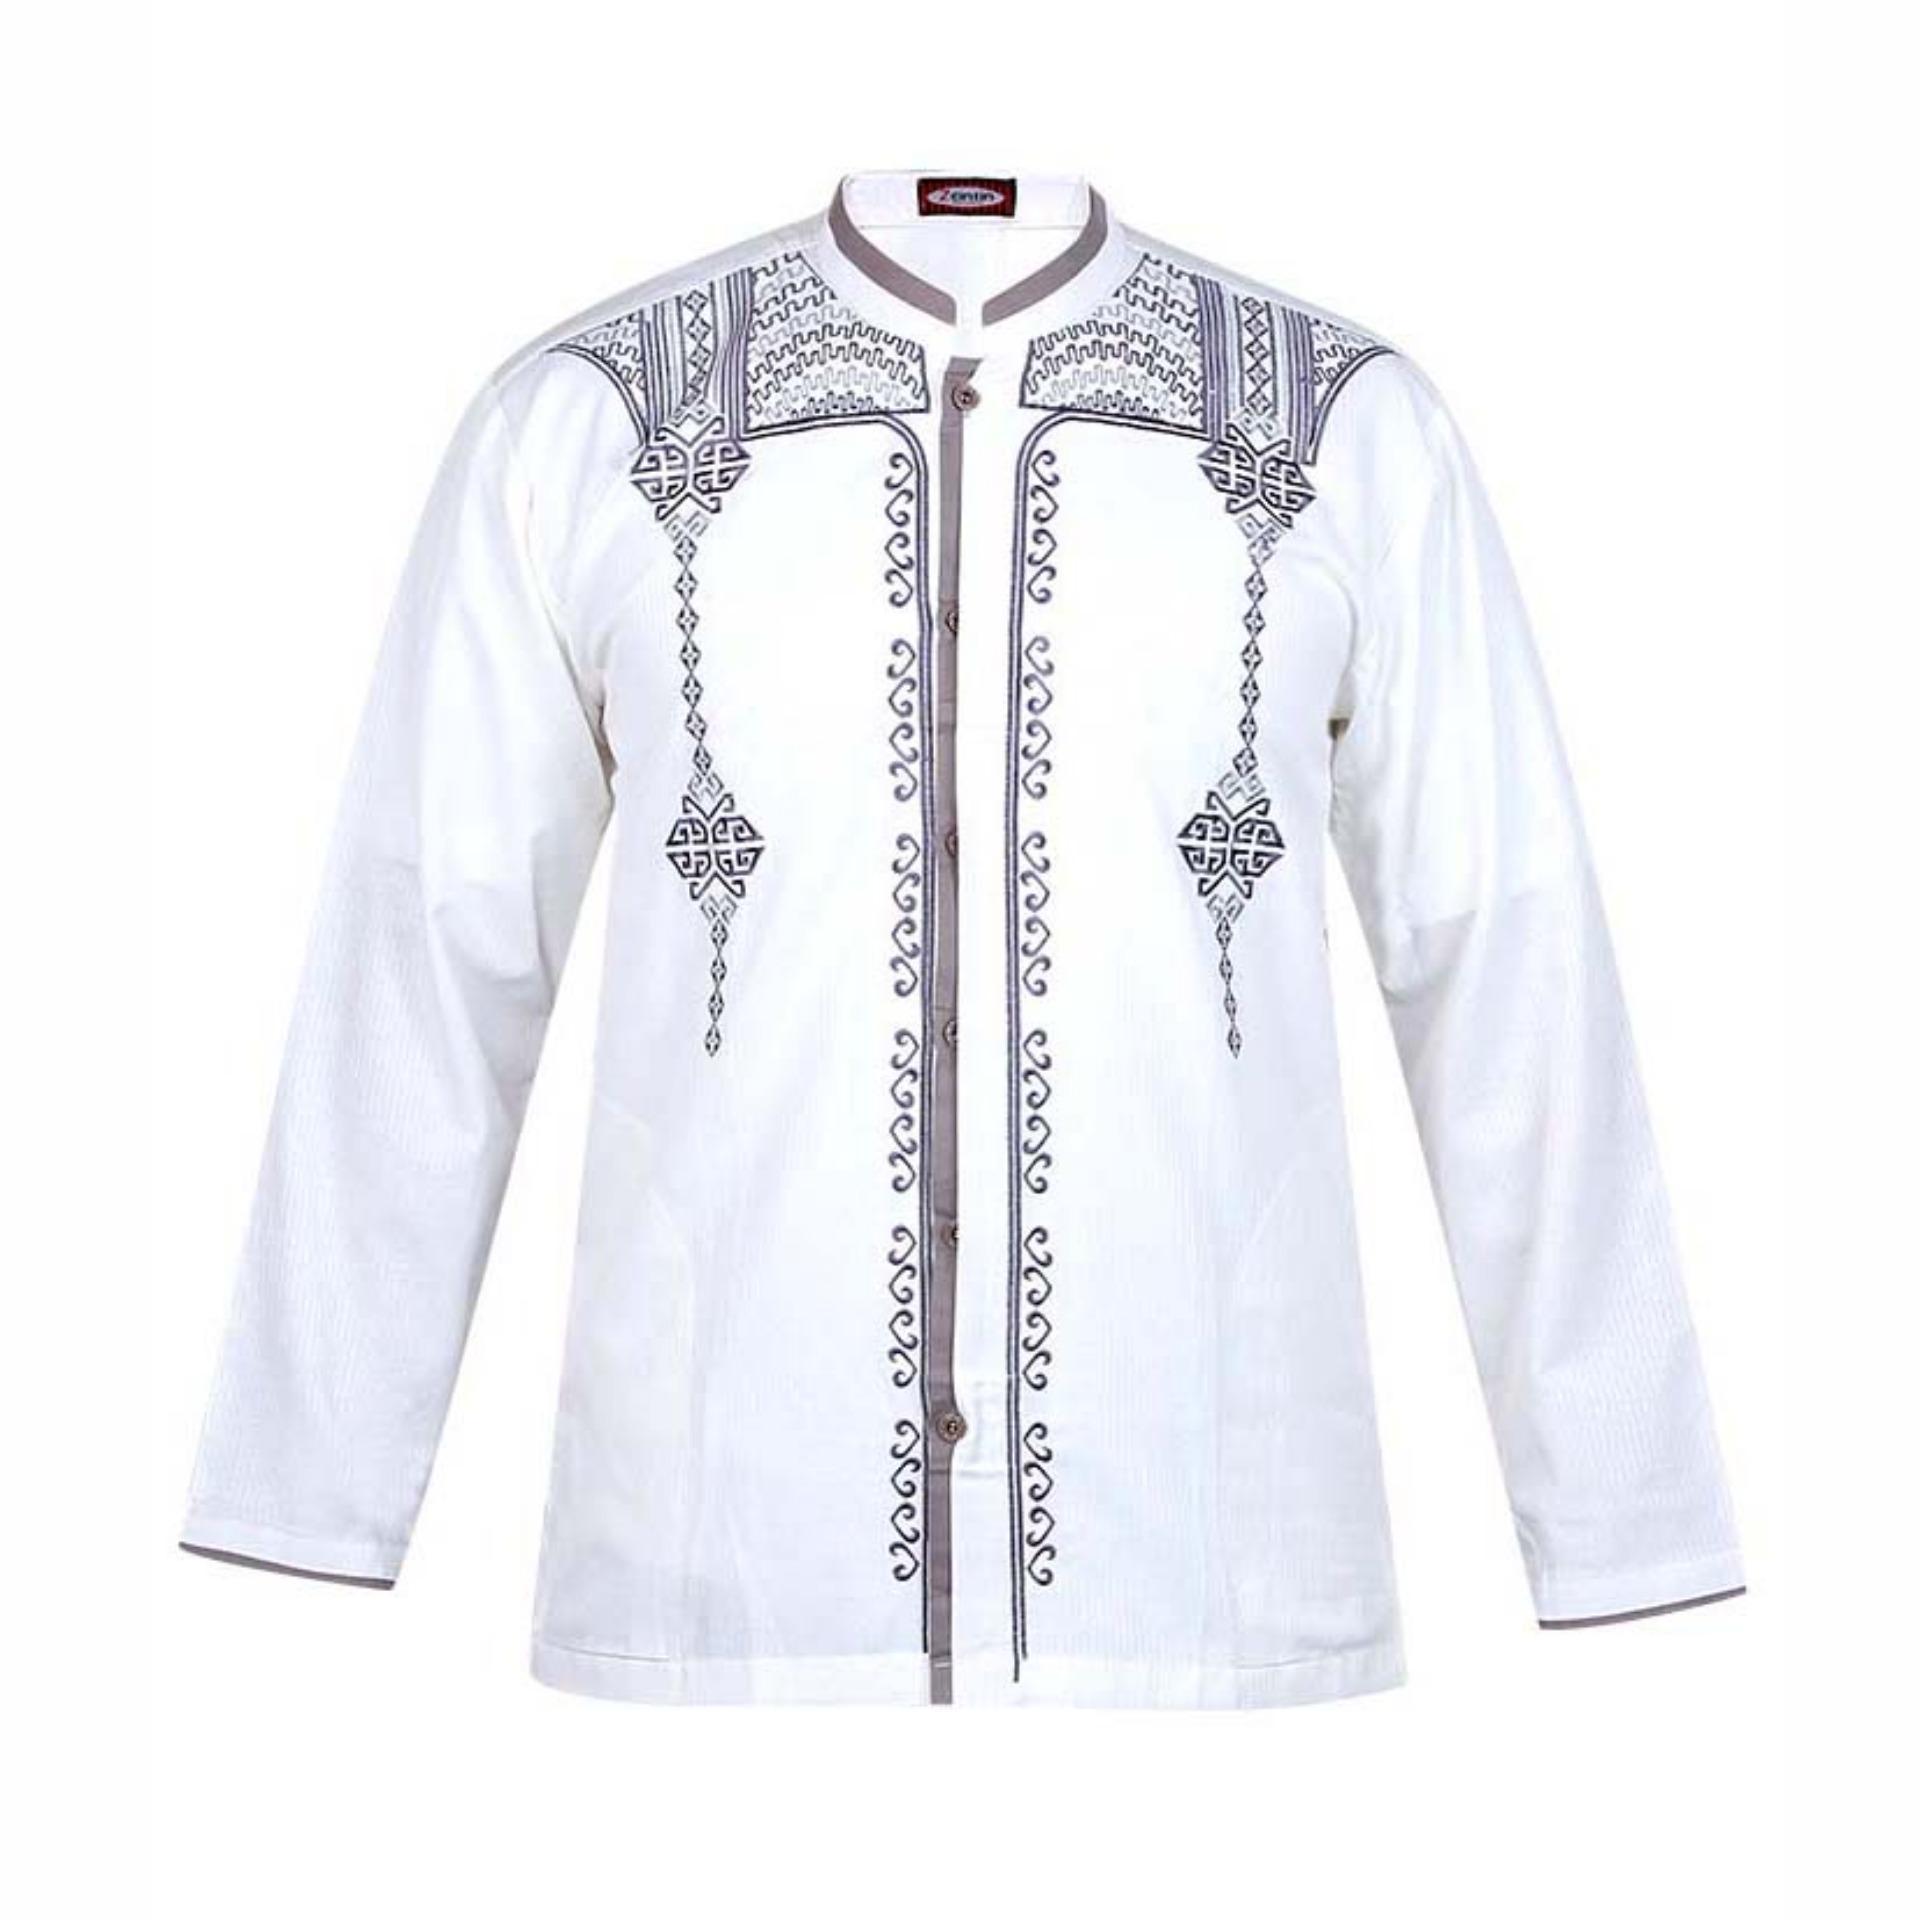 Zeintin Baju Koko Trendy Pria Uj 0368 Caramel Daftar Harga A7836 Kemeja Batik Slimfit Zkp006